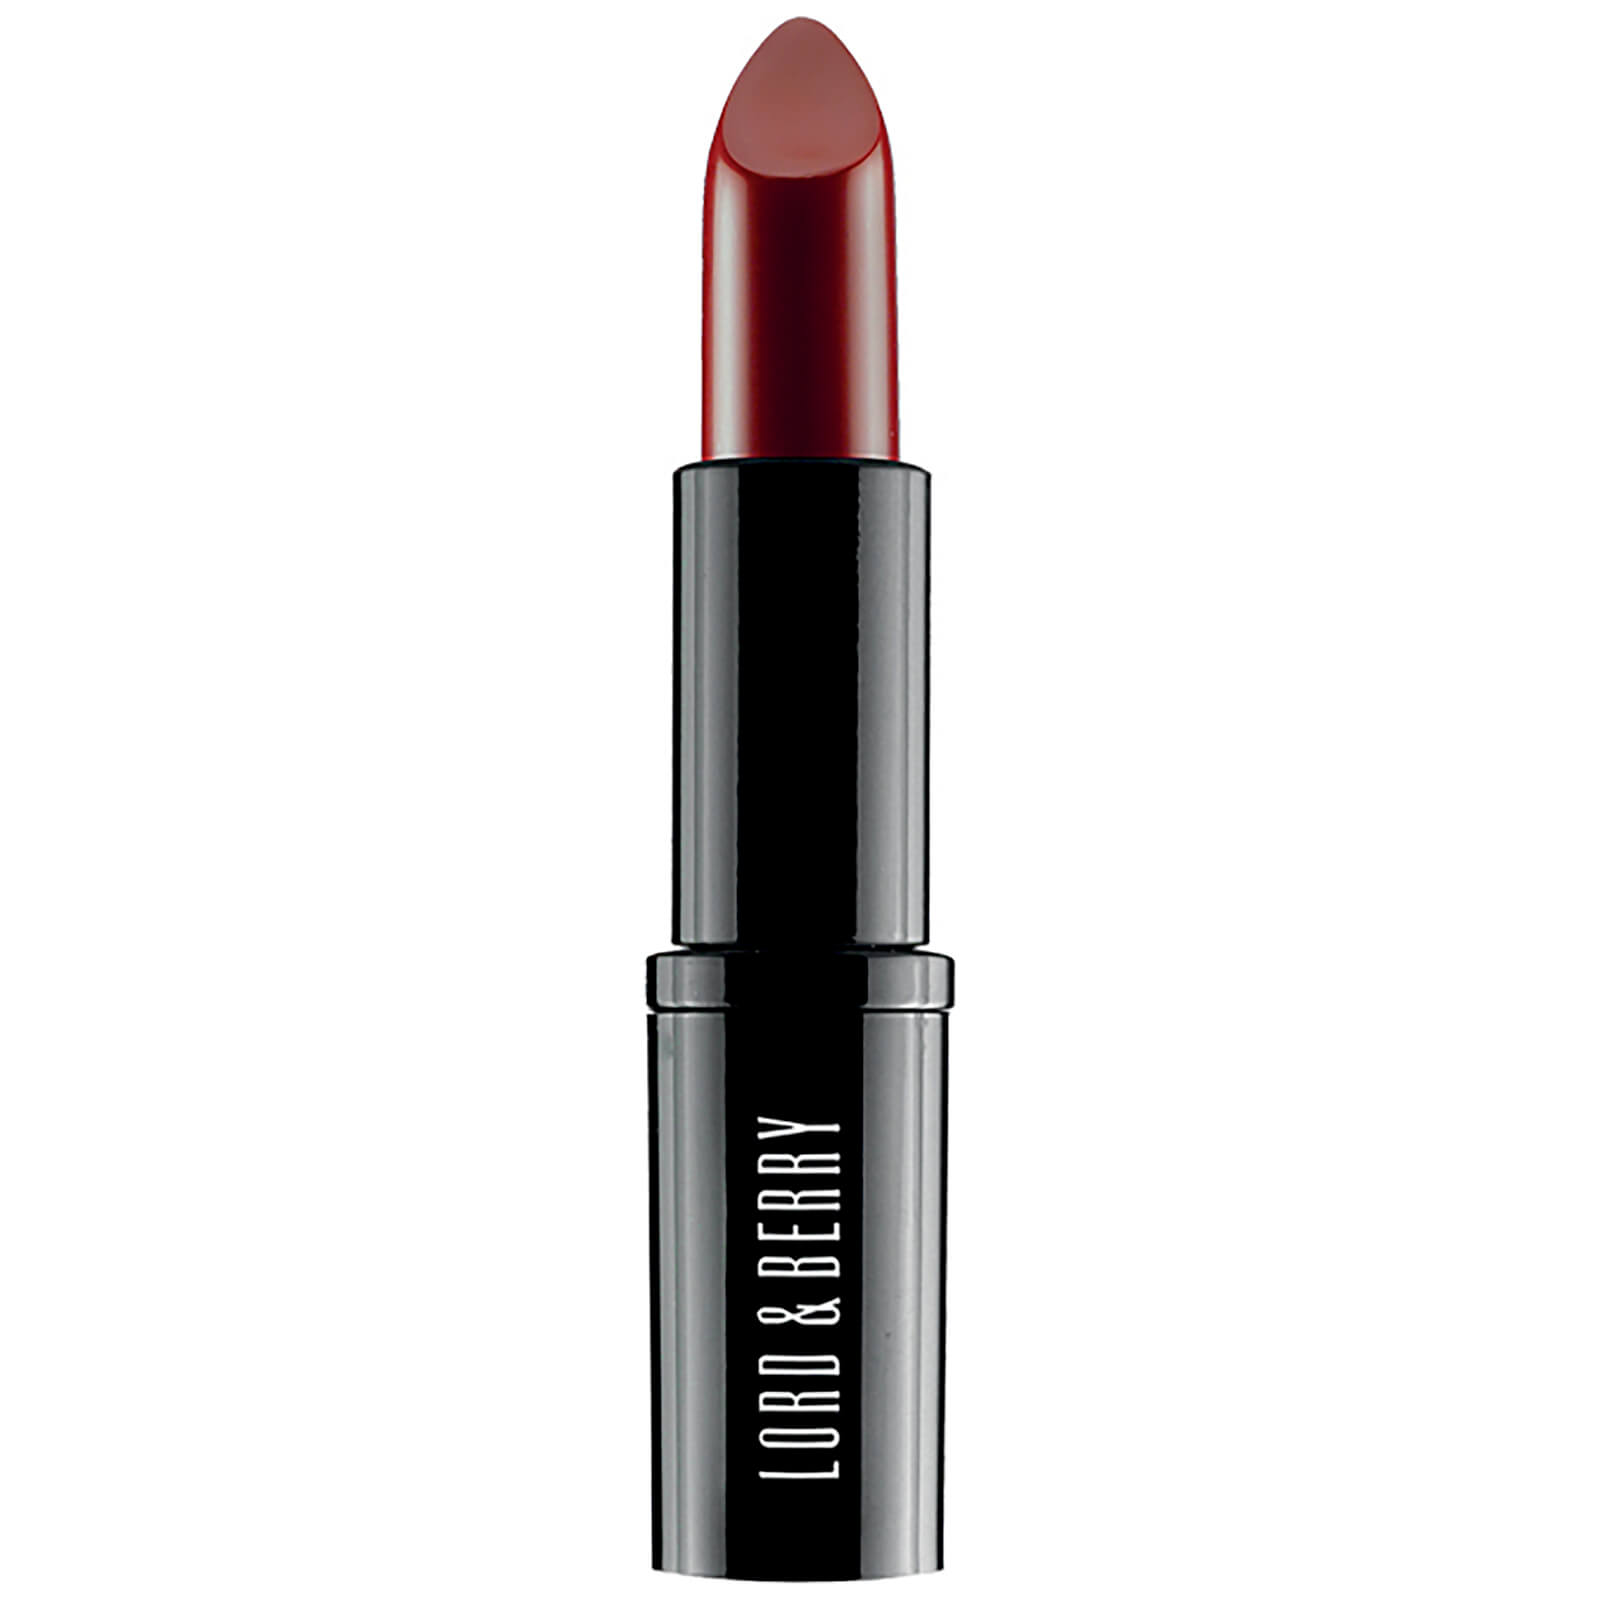 Lord & Berry Absolute Intensity Lipstick (разные цвета) - Magnetic Smile  - Купить